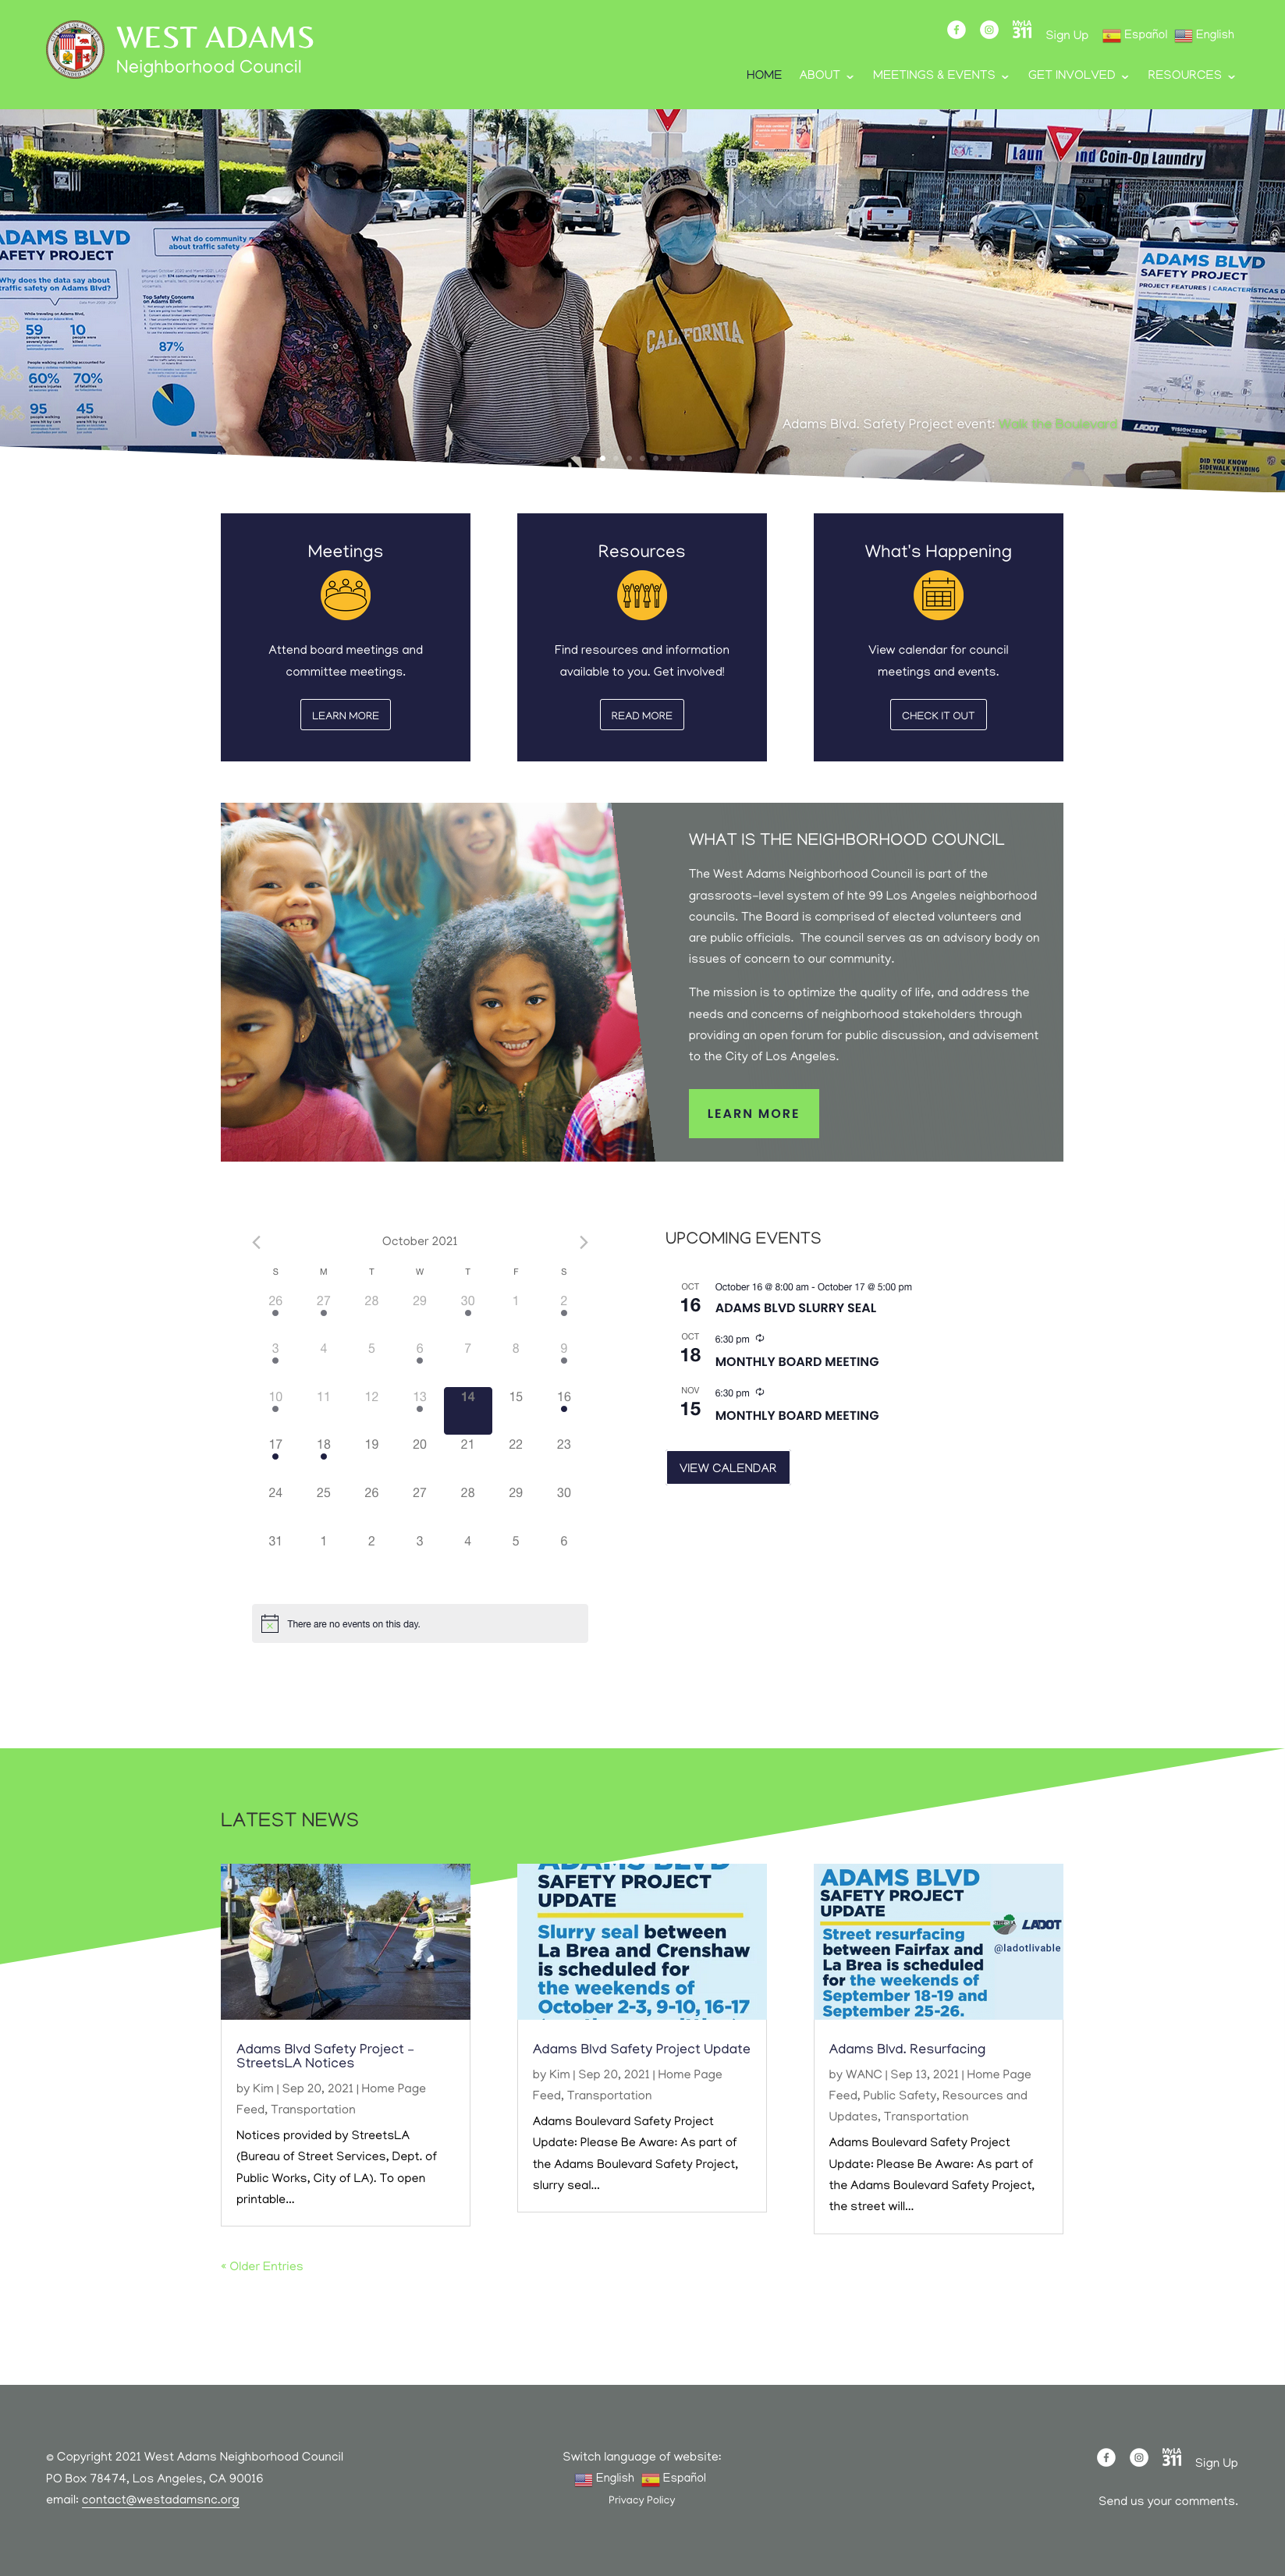 West Adams Neighborhood Council redesigned website